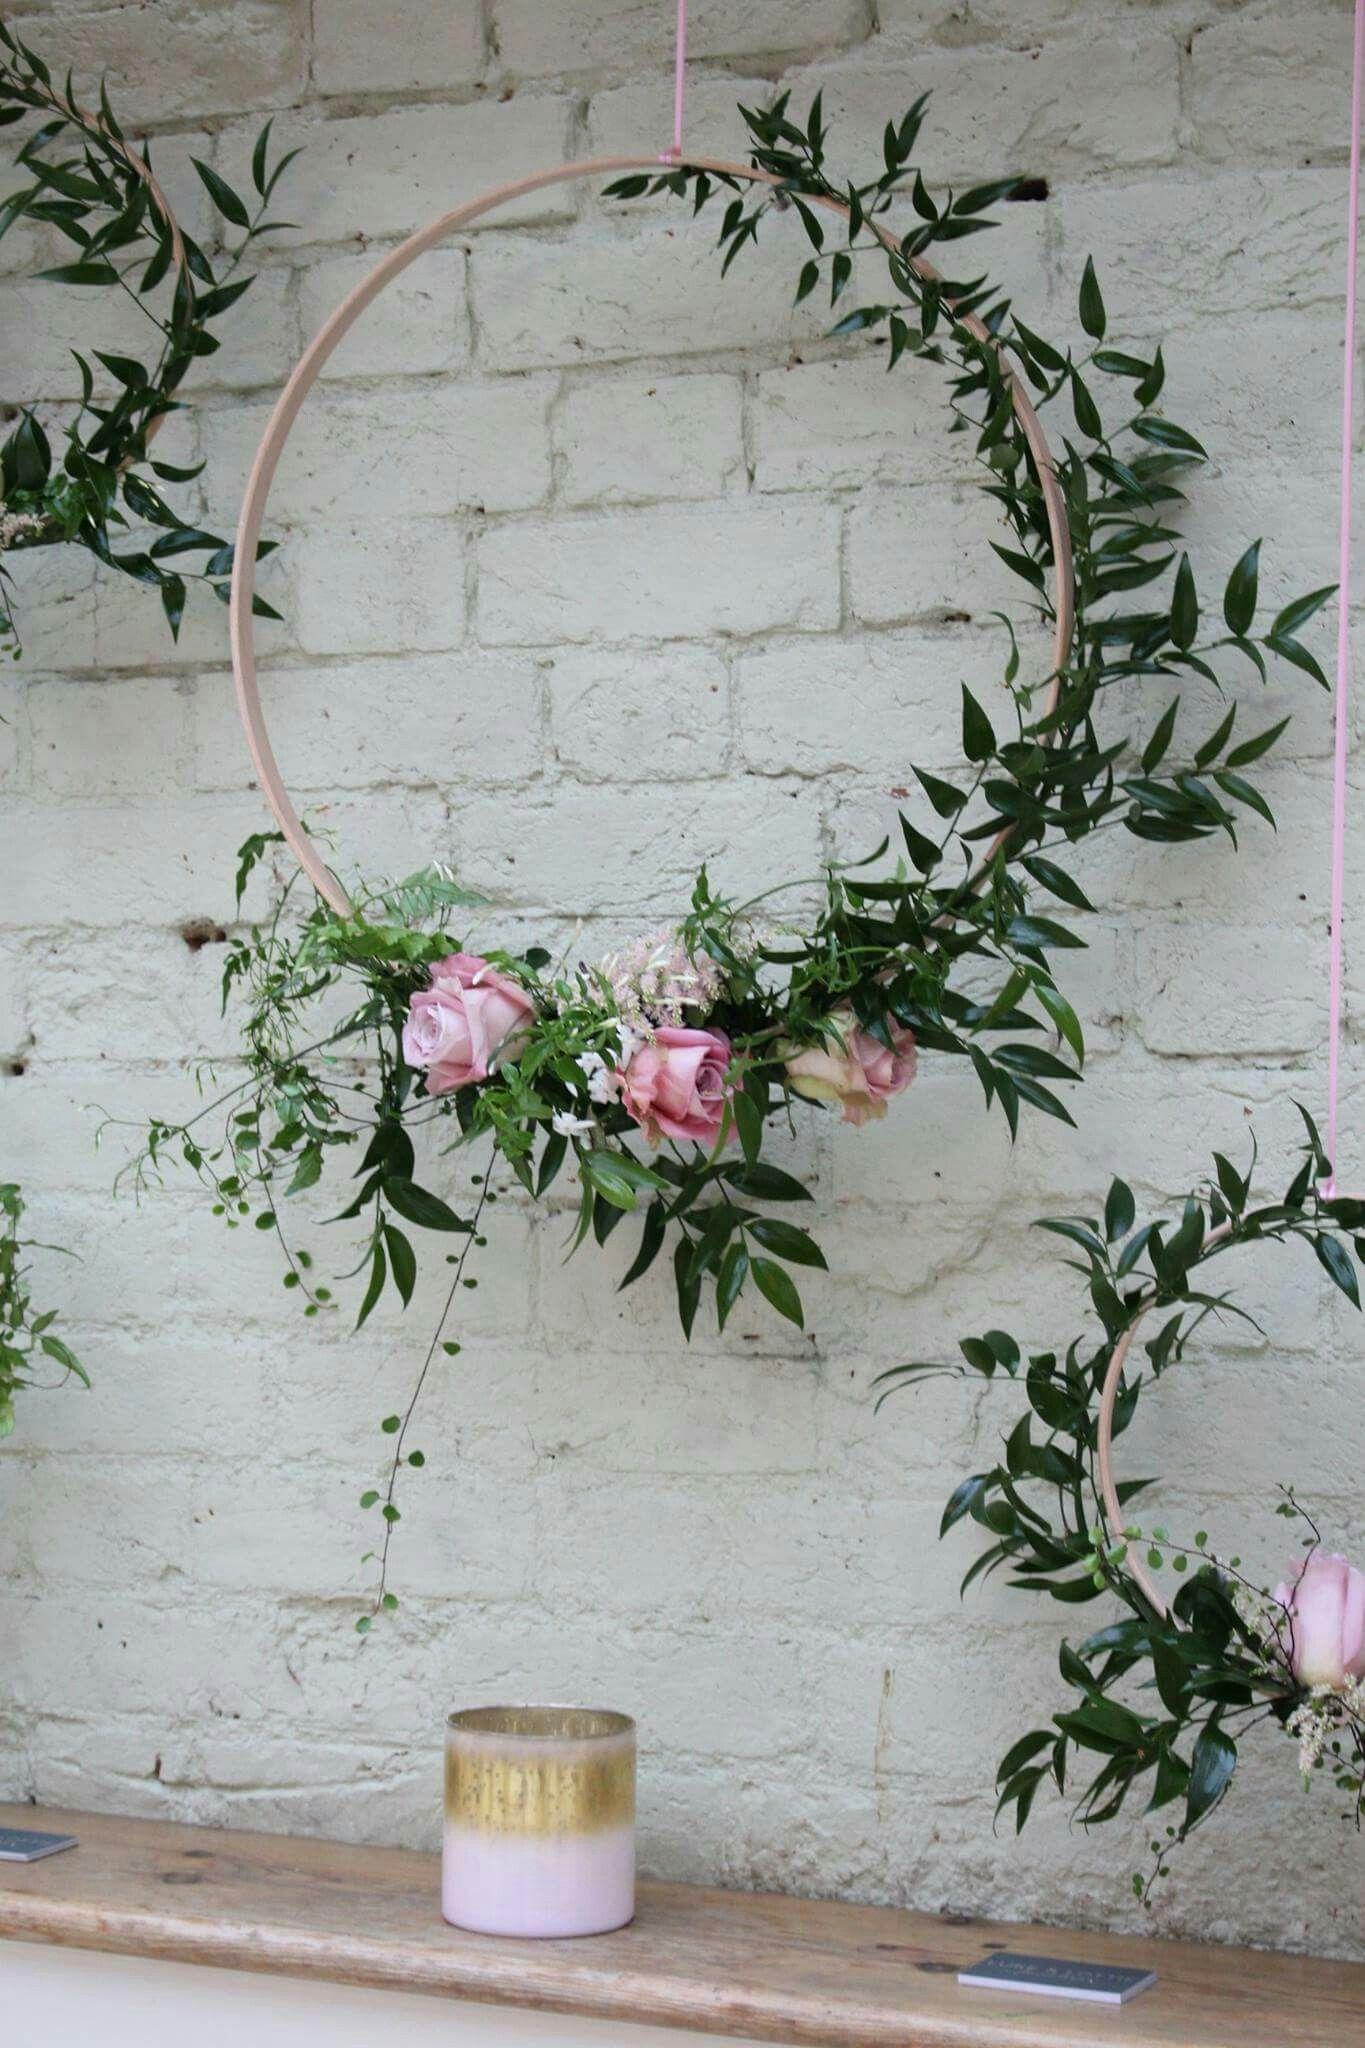 Diy flower decorations wedding  Pin by Marisa on B  Pinterest  Wedding Wreaths and Weddings